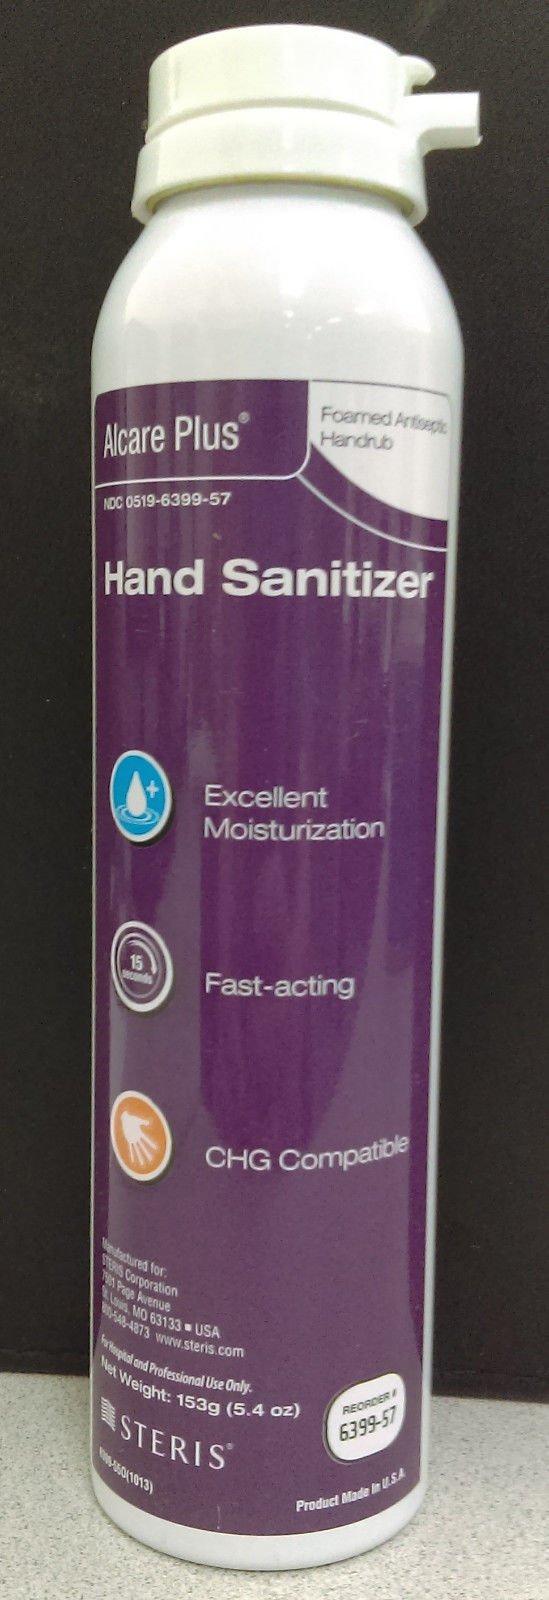 FOAM, SANITIZER, HAND, ALCARE, 5.4OZ ( FOAM, SANITIZER, HAND, ALCARE, 5.4OZ ) 24 Each / Case